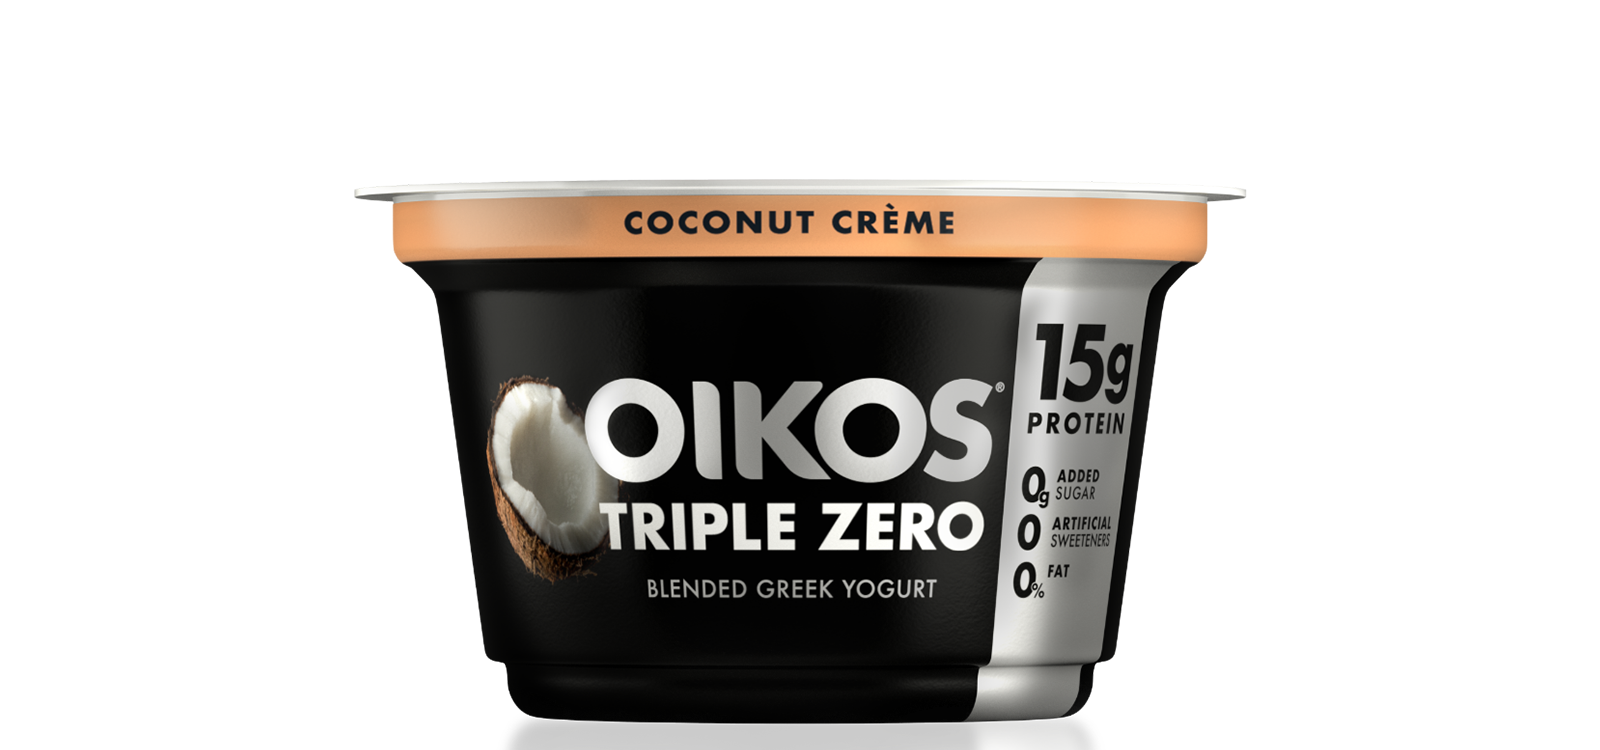 Coconut Crème Oikos Triple Zero High Protein Nonfat Greek Yogurt